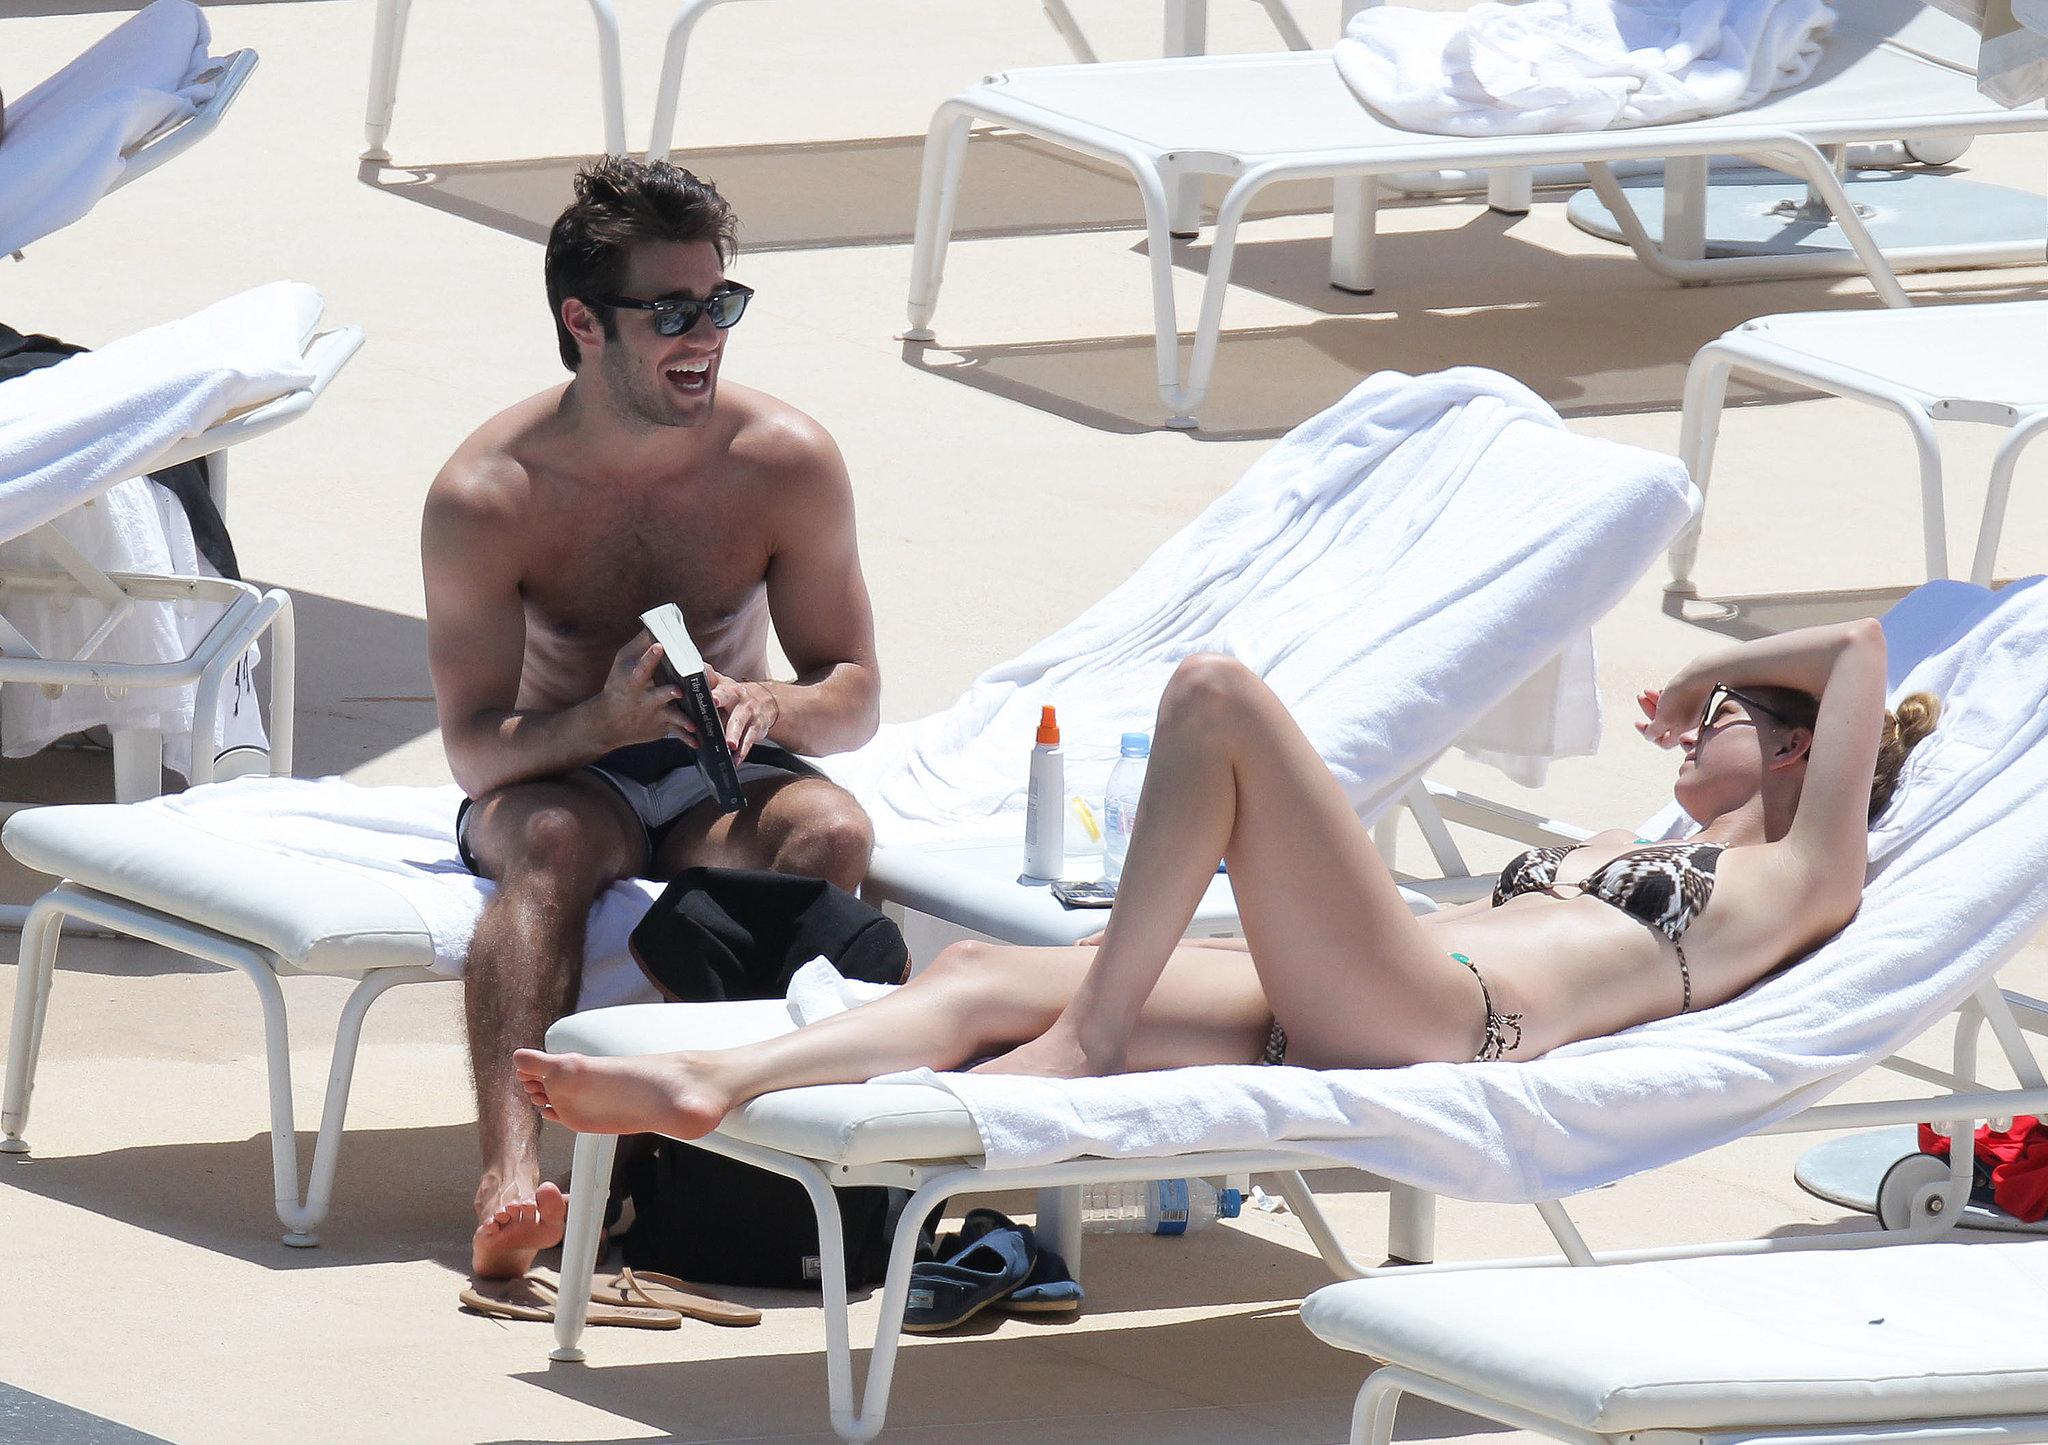 Emily VanCamp and Joshua Bowman lounged poolside in Monaco ...